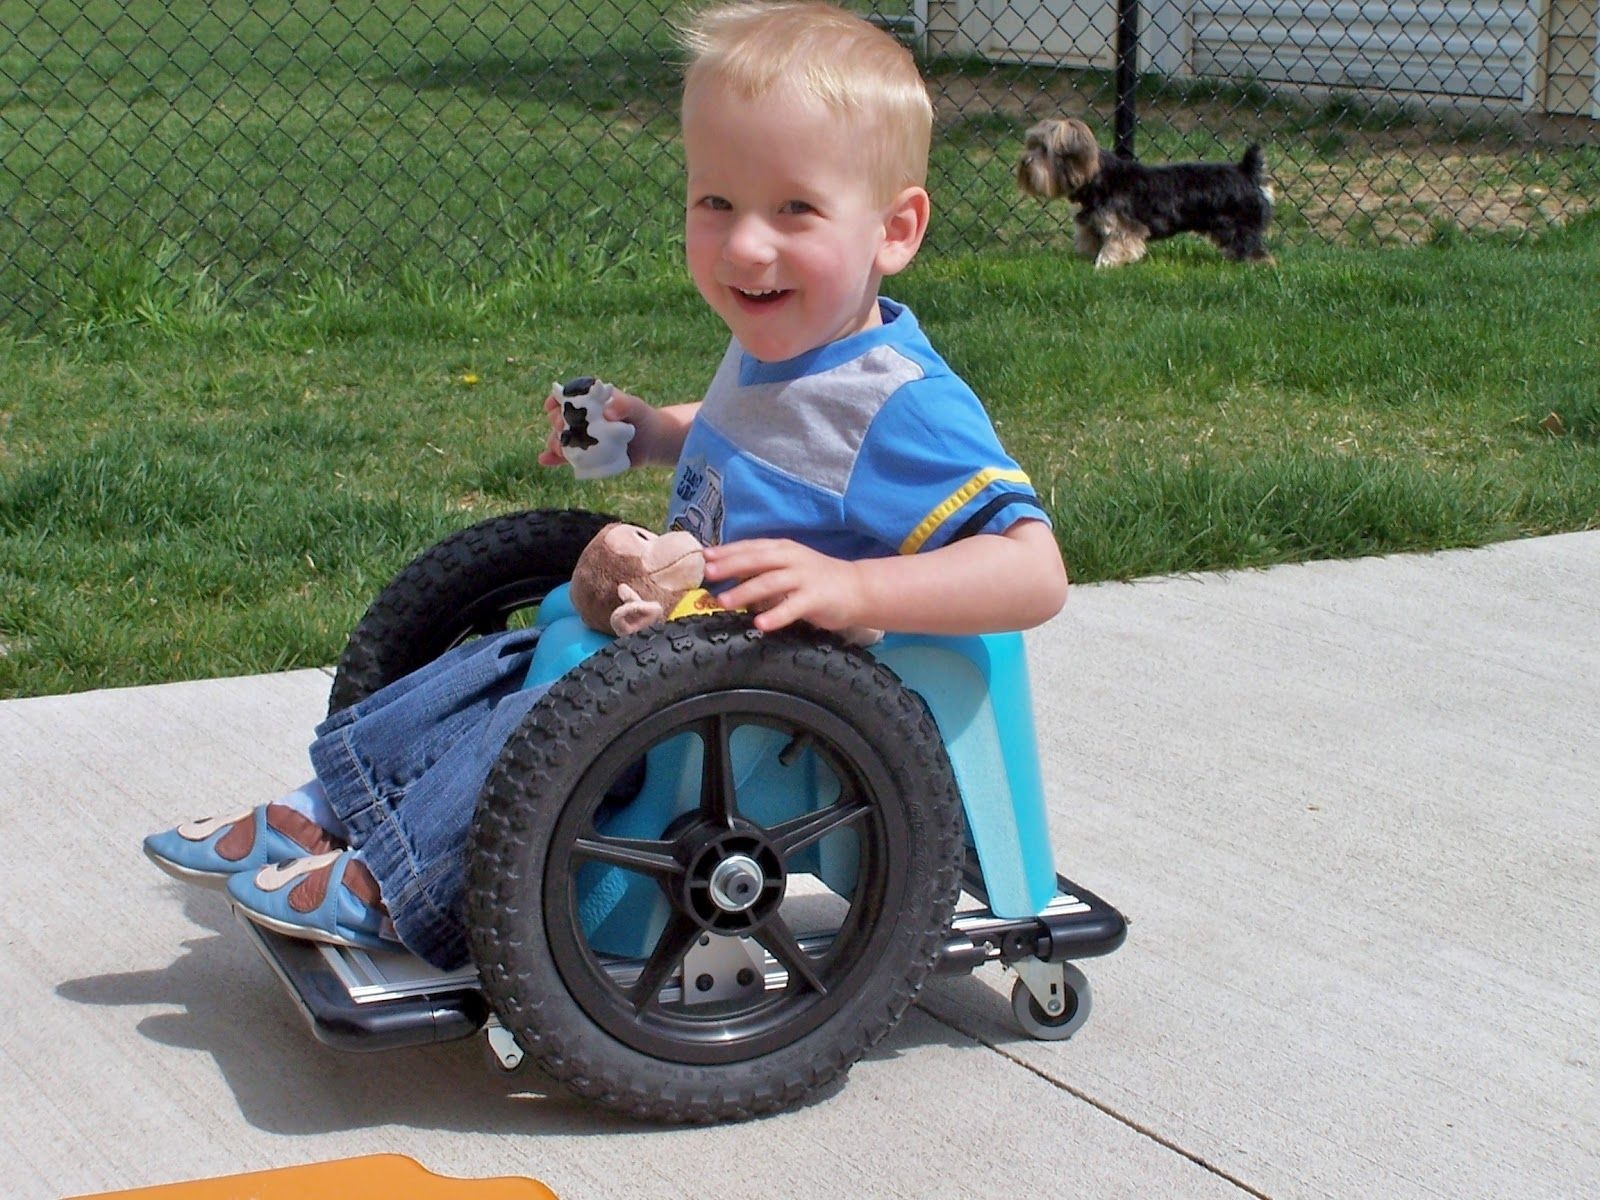 Power wheelchair kids - Kids Wheelchair See It Believe It Watch Thousands Of Sci Videos At Spinalpedia